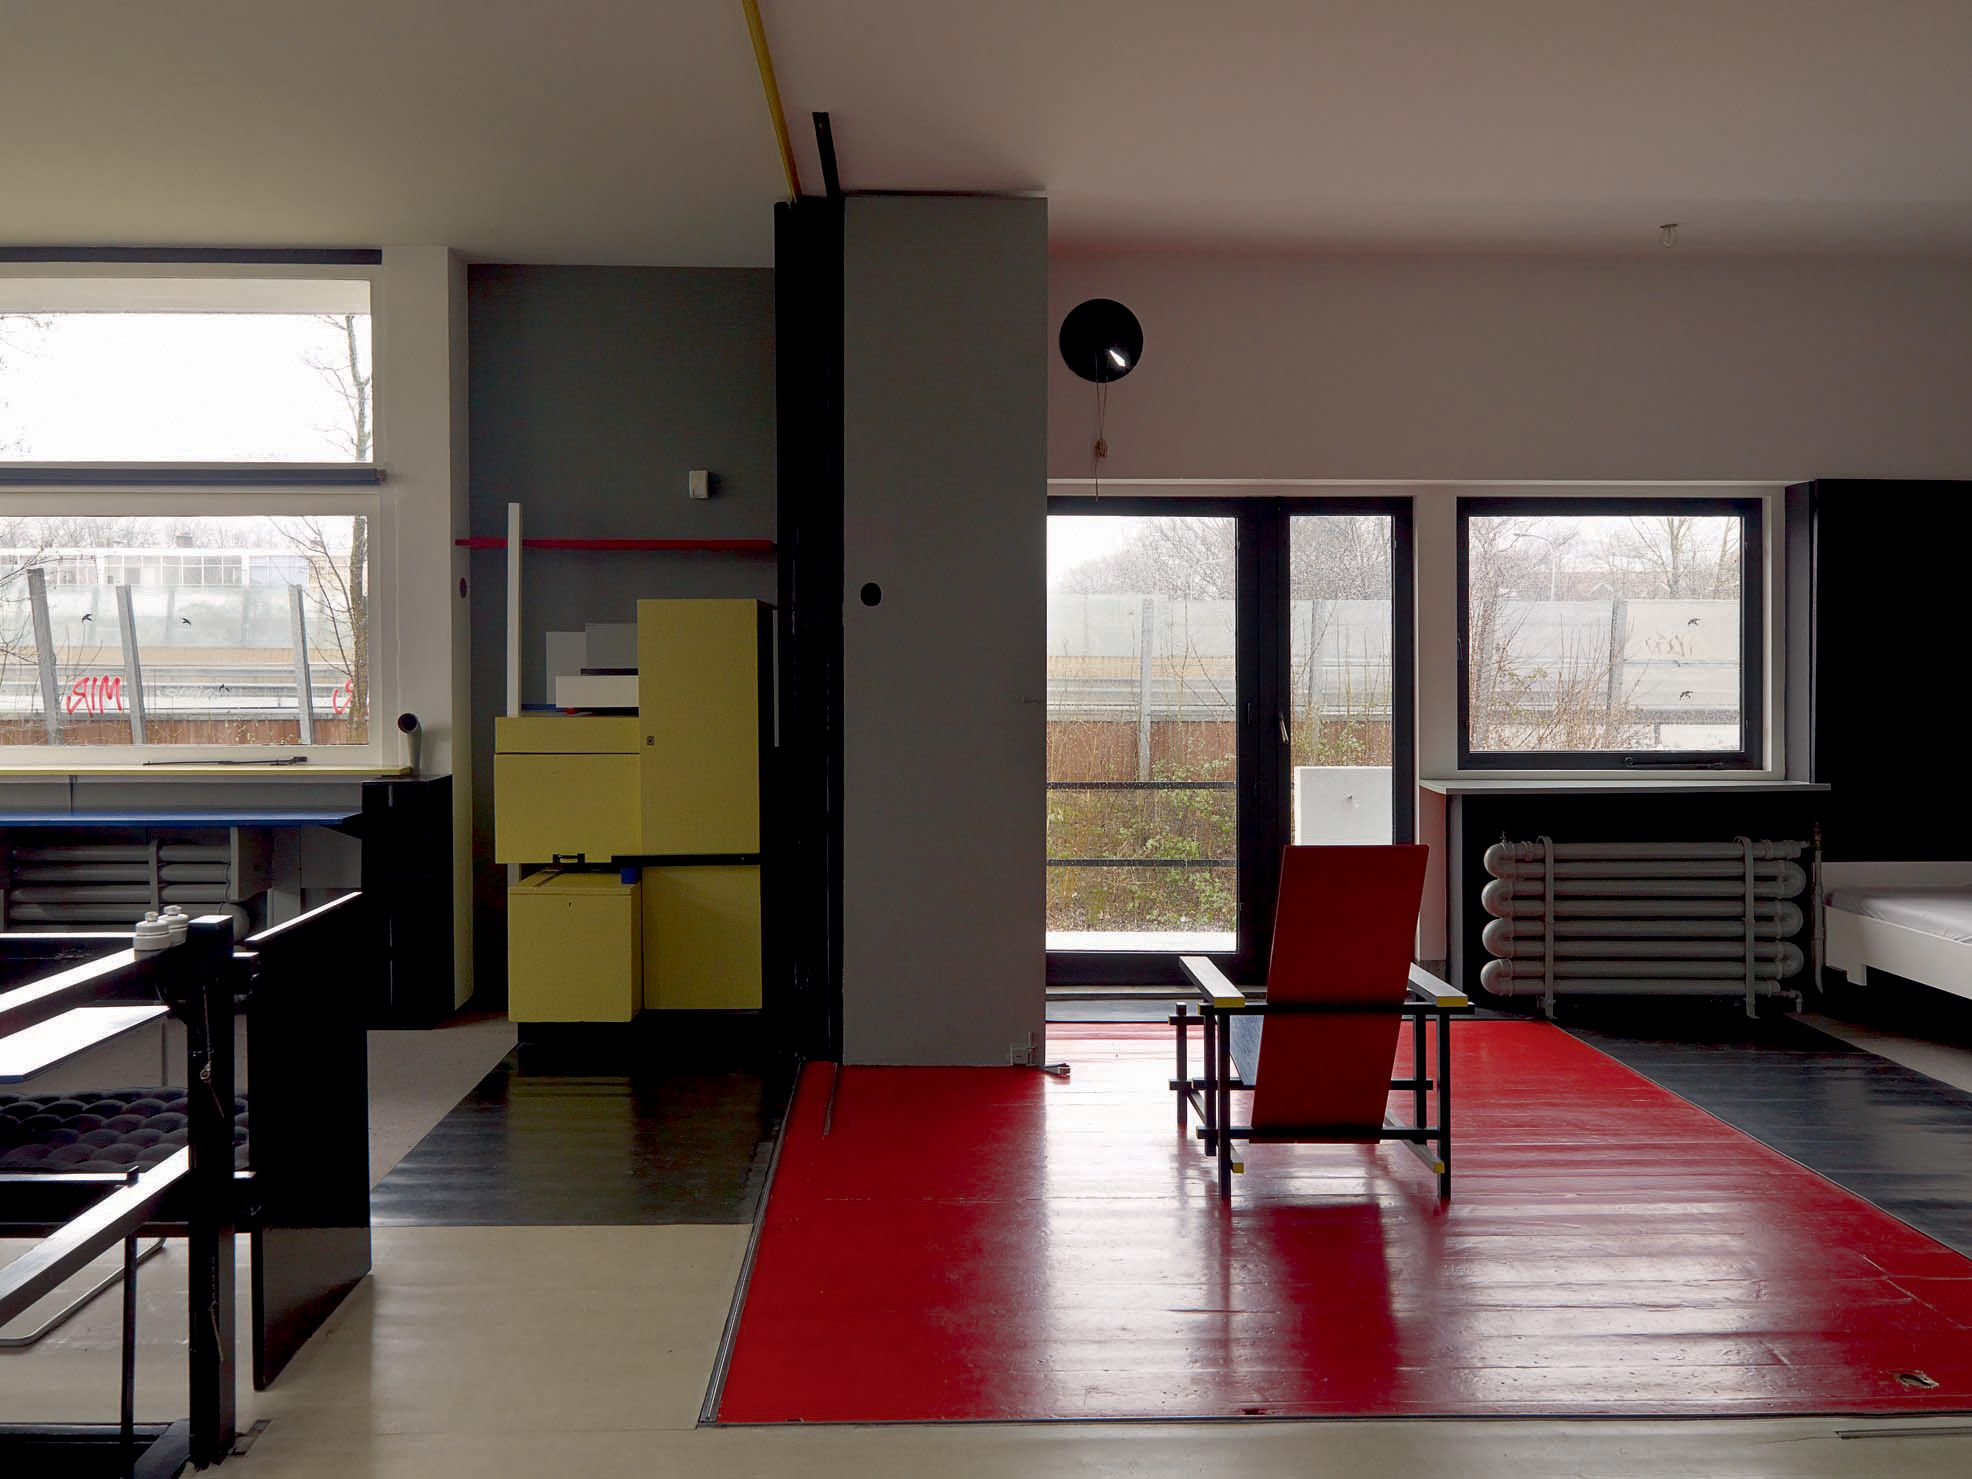 Schroder House Utrecht 1924 Architecture Rietveld Bauhaus InteriorBauhaus DesignBauhaus